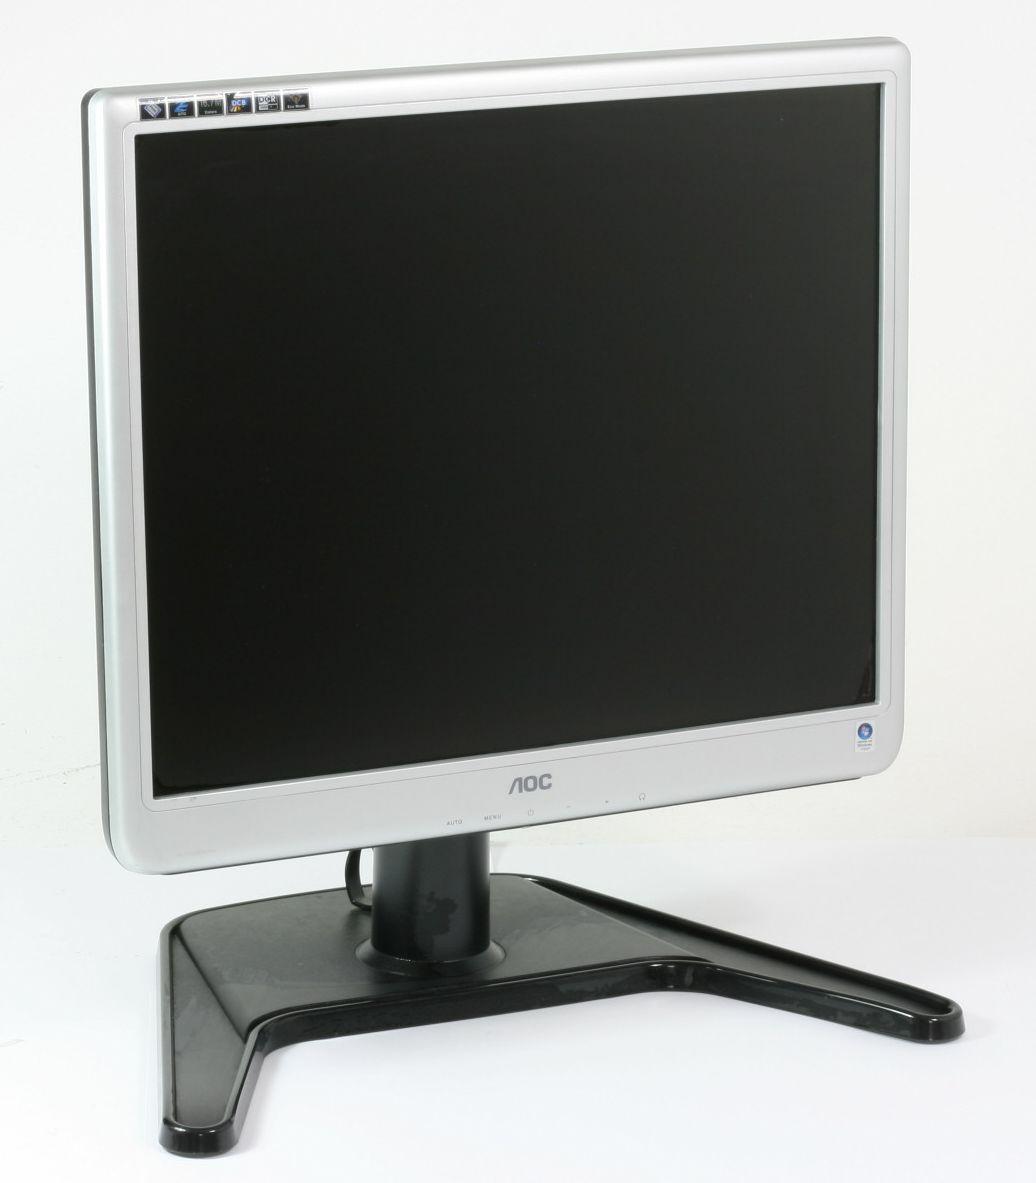 "AOC 197Pk2 Bildschirm 19 Zoll Monitor 48,3 cm LCD Flachbildschirm TFT 19"" gebraucht"